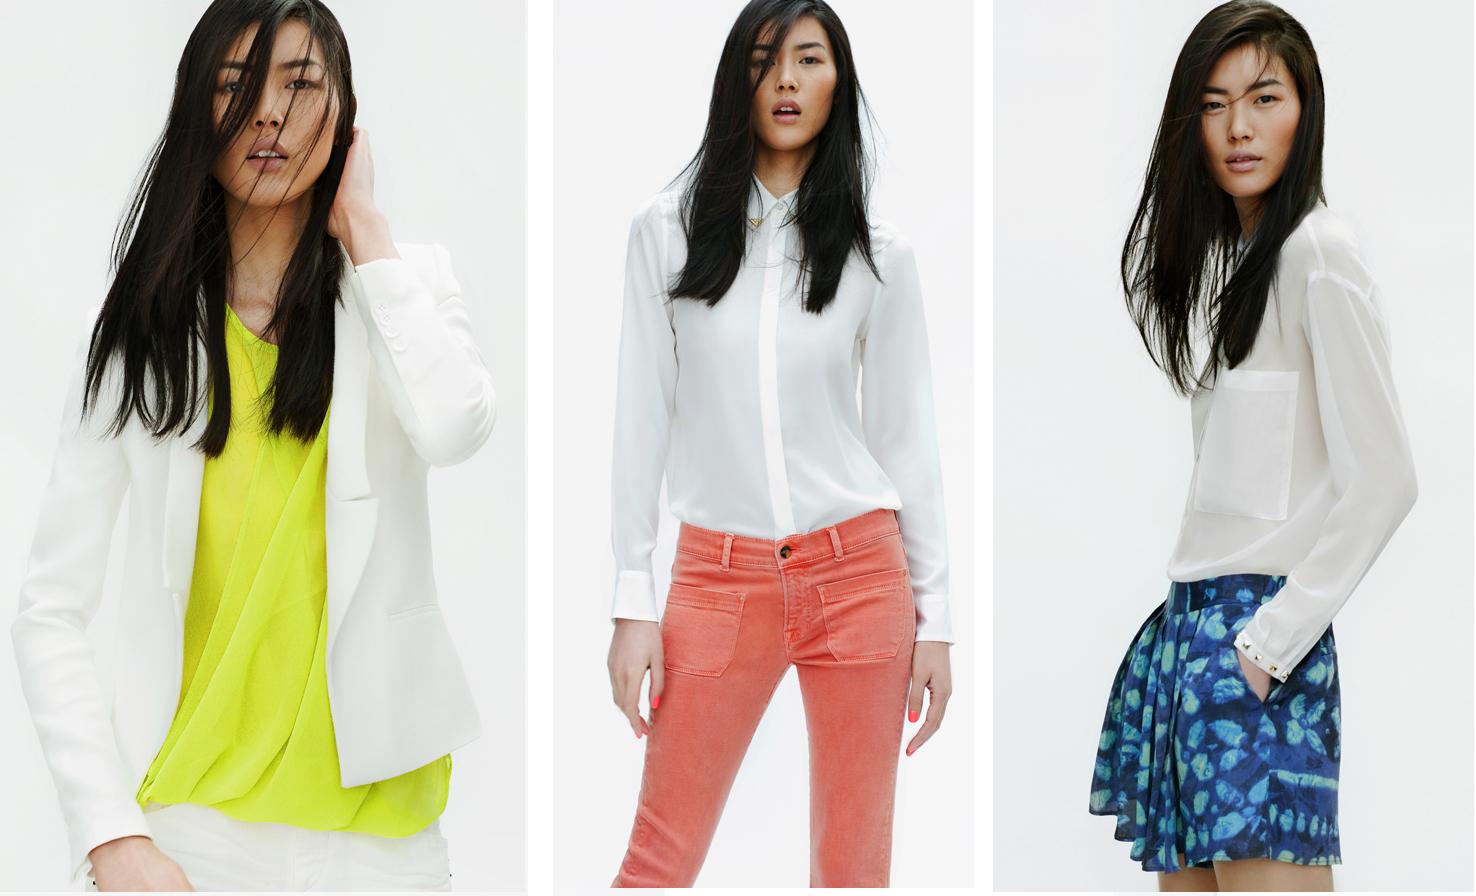 cf26bf4bae3 Scrambled Fashion  Zara sets sail for spring